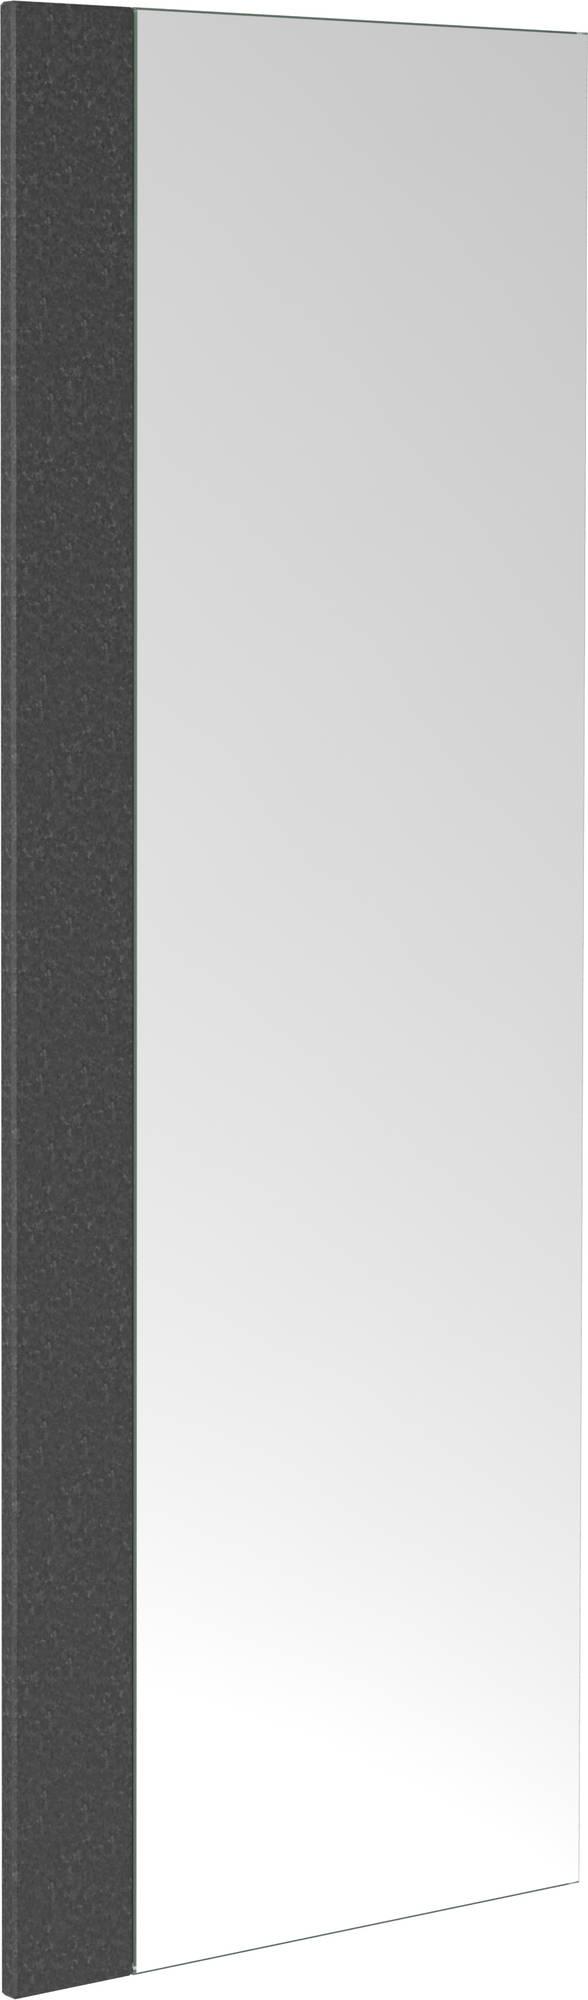 Badkamerspiegel Clou First met Gezoet Basalt Strip 30x2x80cm